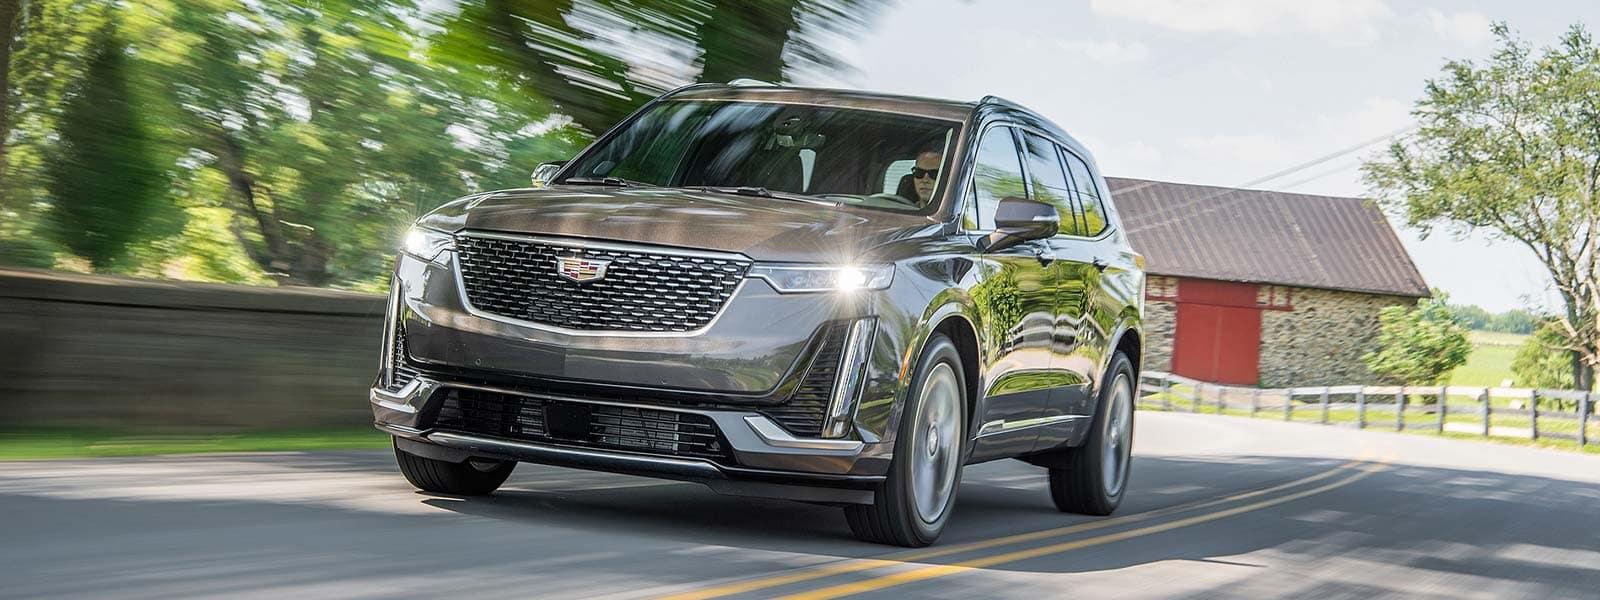 Buy or lease new 2021 Cadillac XT6 in Woodbridge Ontario